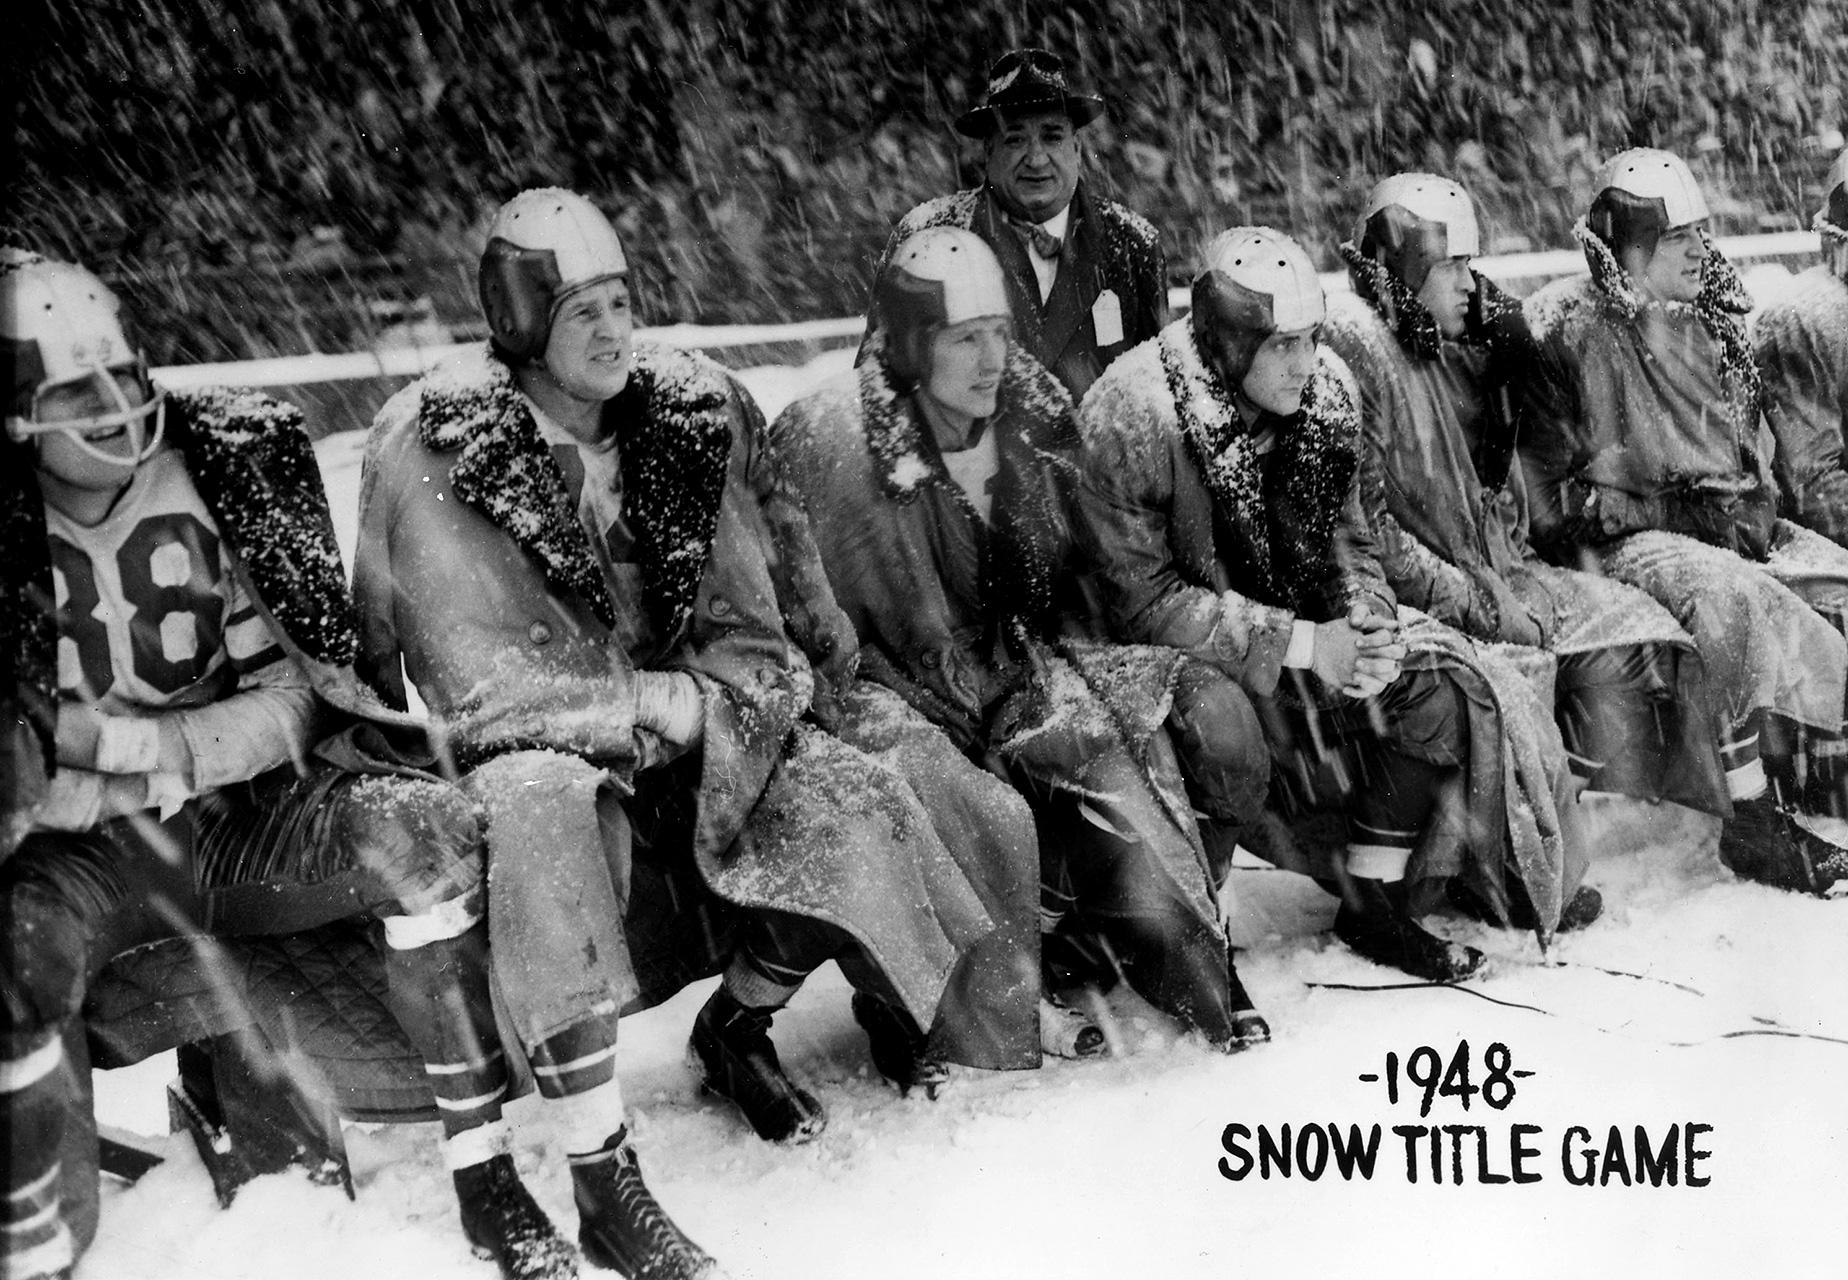 1948 NFL CHAMPIONSHIP GAME